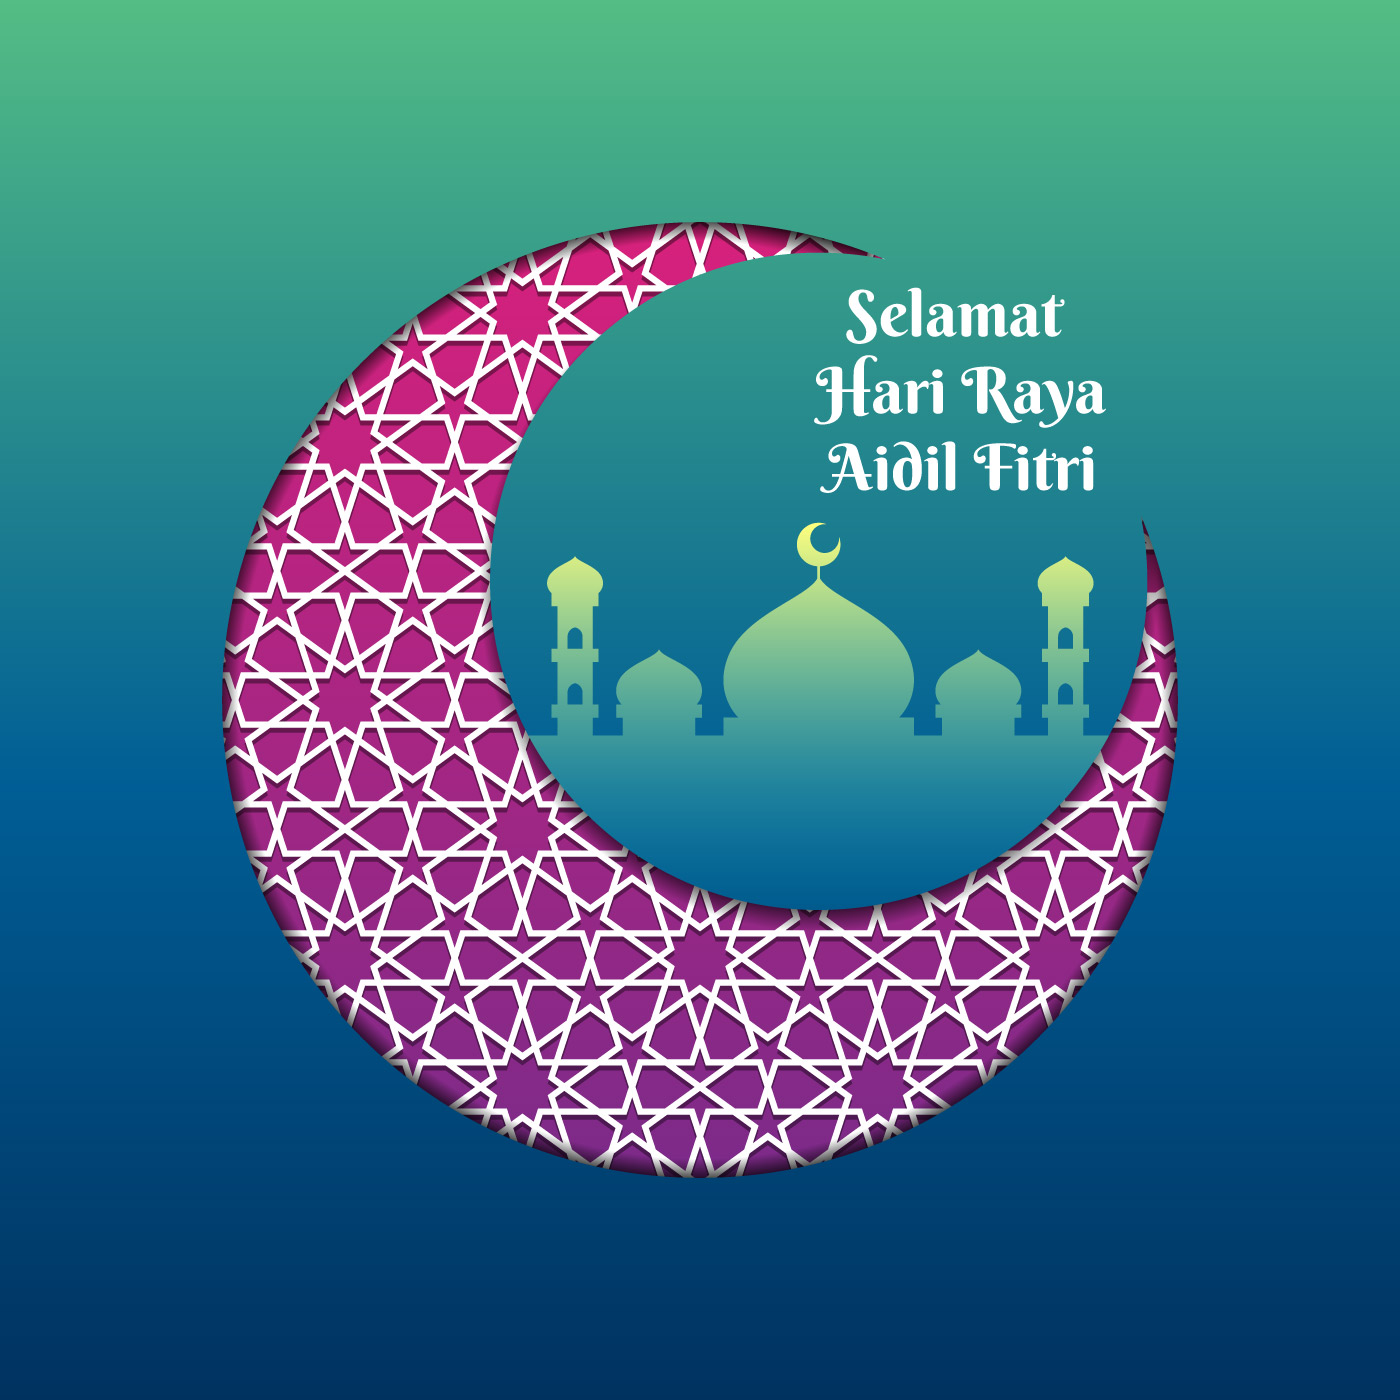 Hari Raya Greeting Template Islamic Crescent With Mosque Vector Illustration Download Free Vectors Clipart Graphics Vector Art